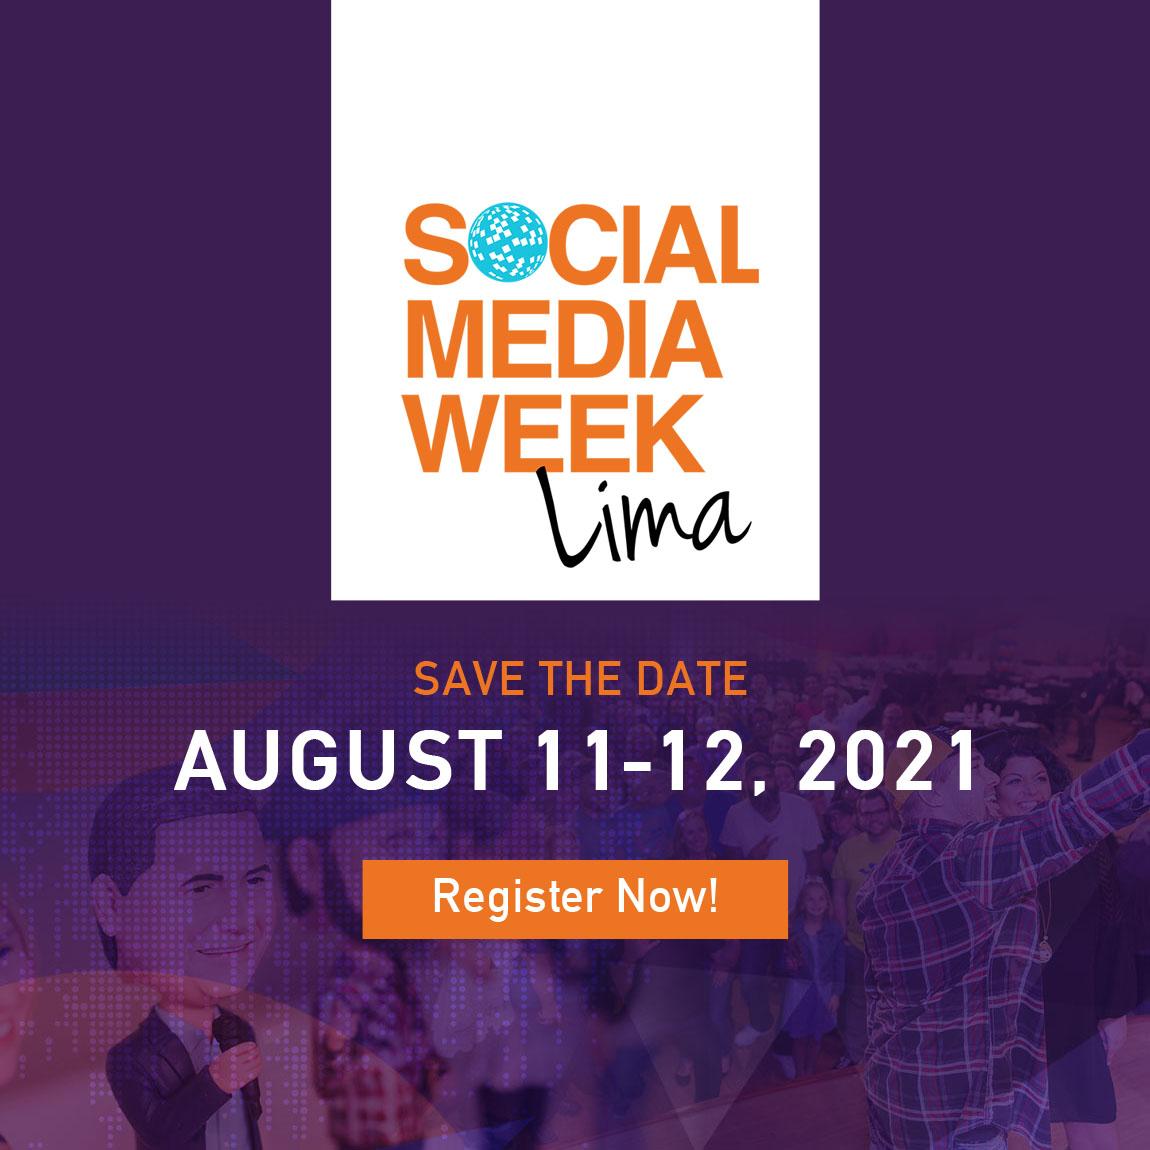 Social Media Week Lima